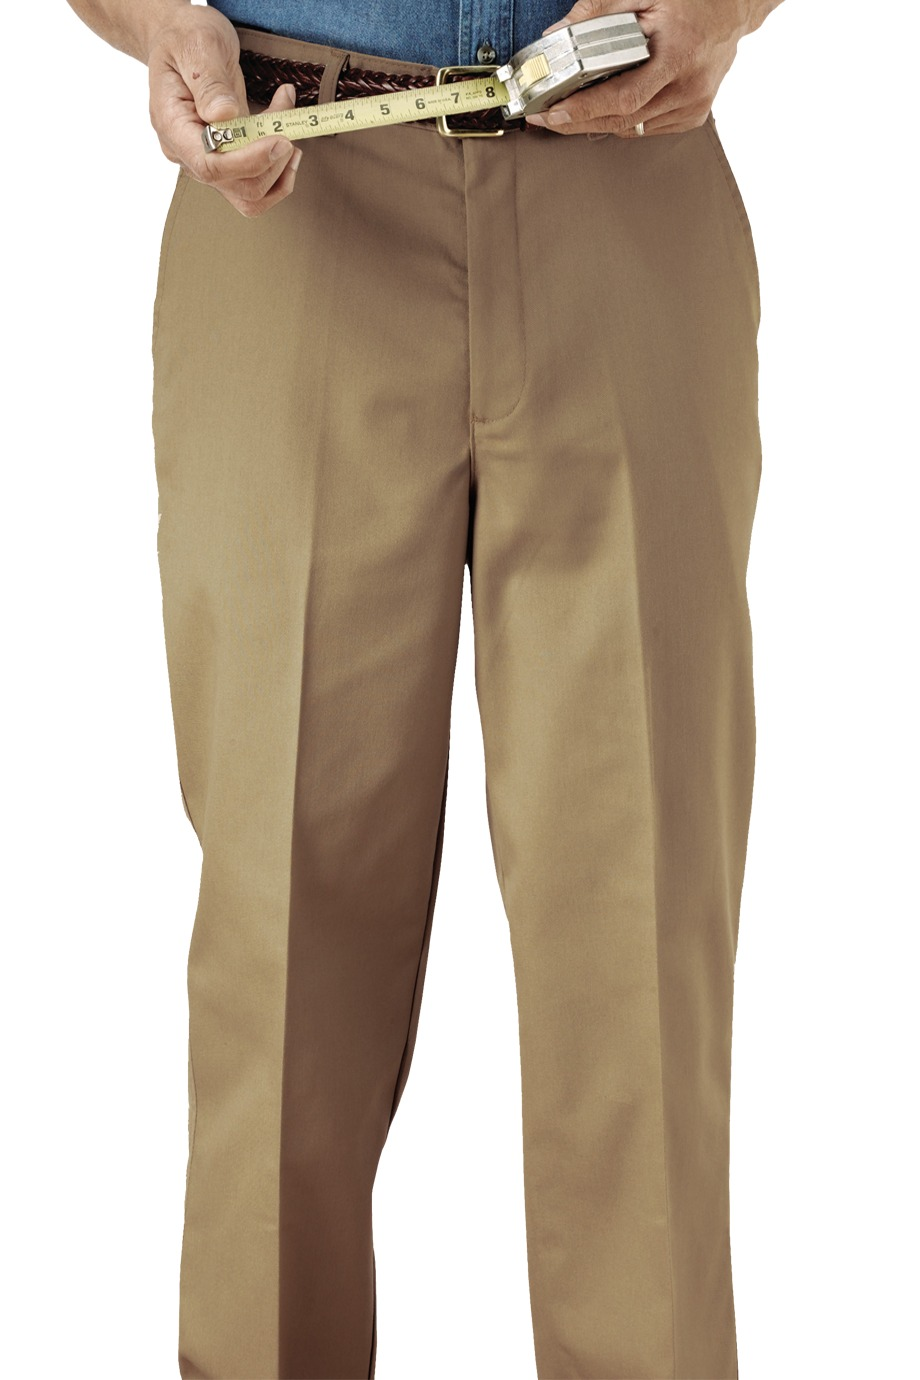 Edwards Garment 2577 Men S Utility Flat Front Pant 20